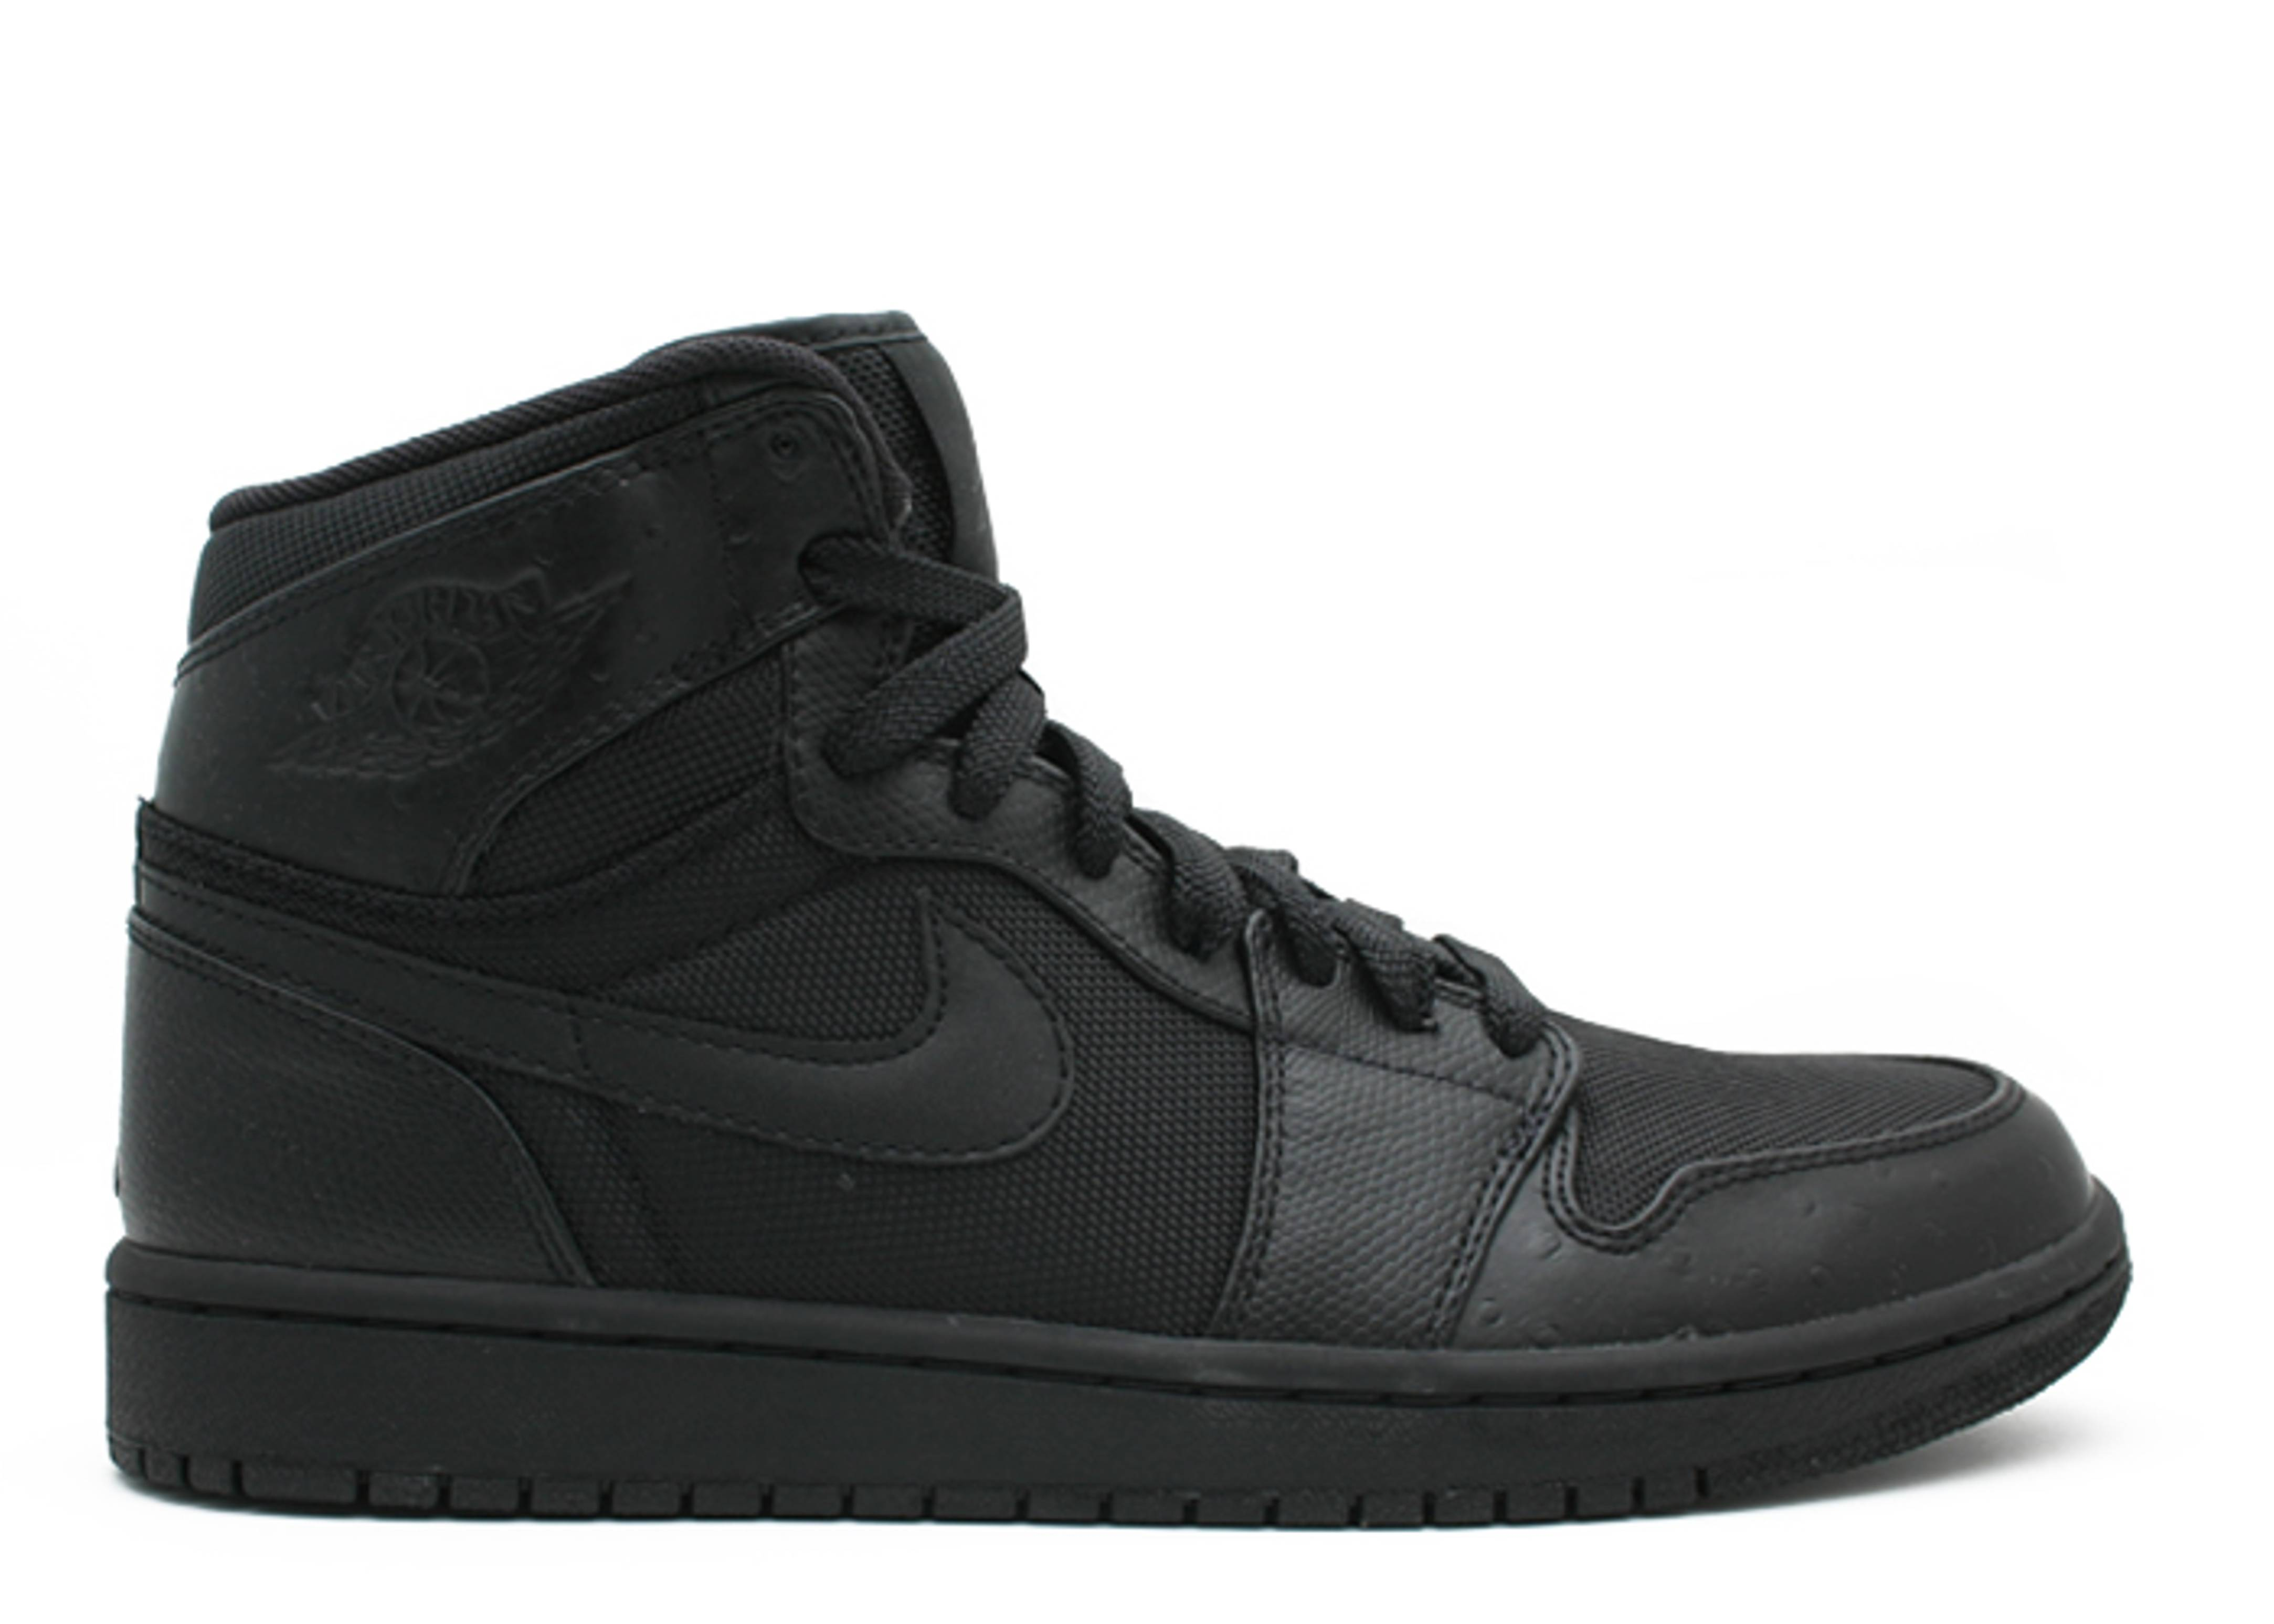 7ff8d1f057e Air Jordan 1 Retro High - Air Jordan - 332550 002 - black black ...